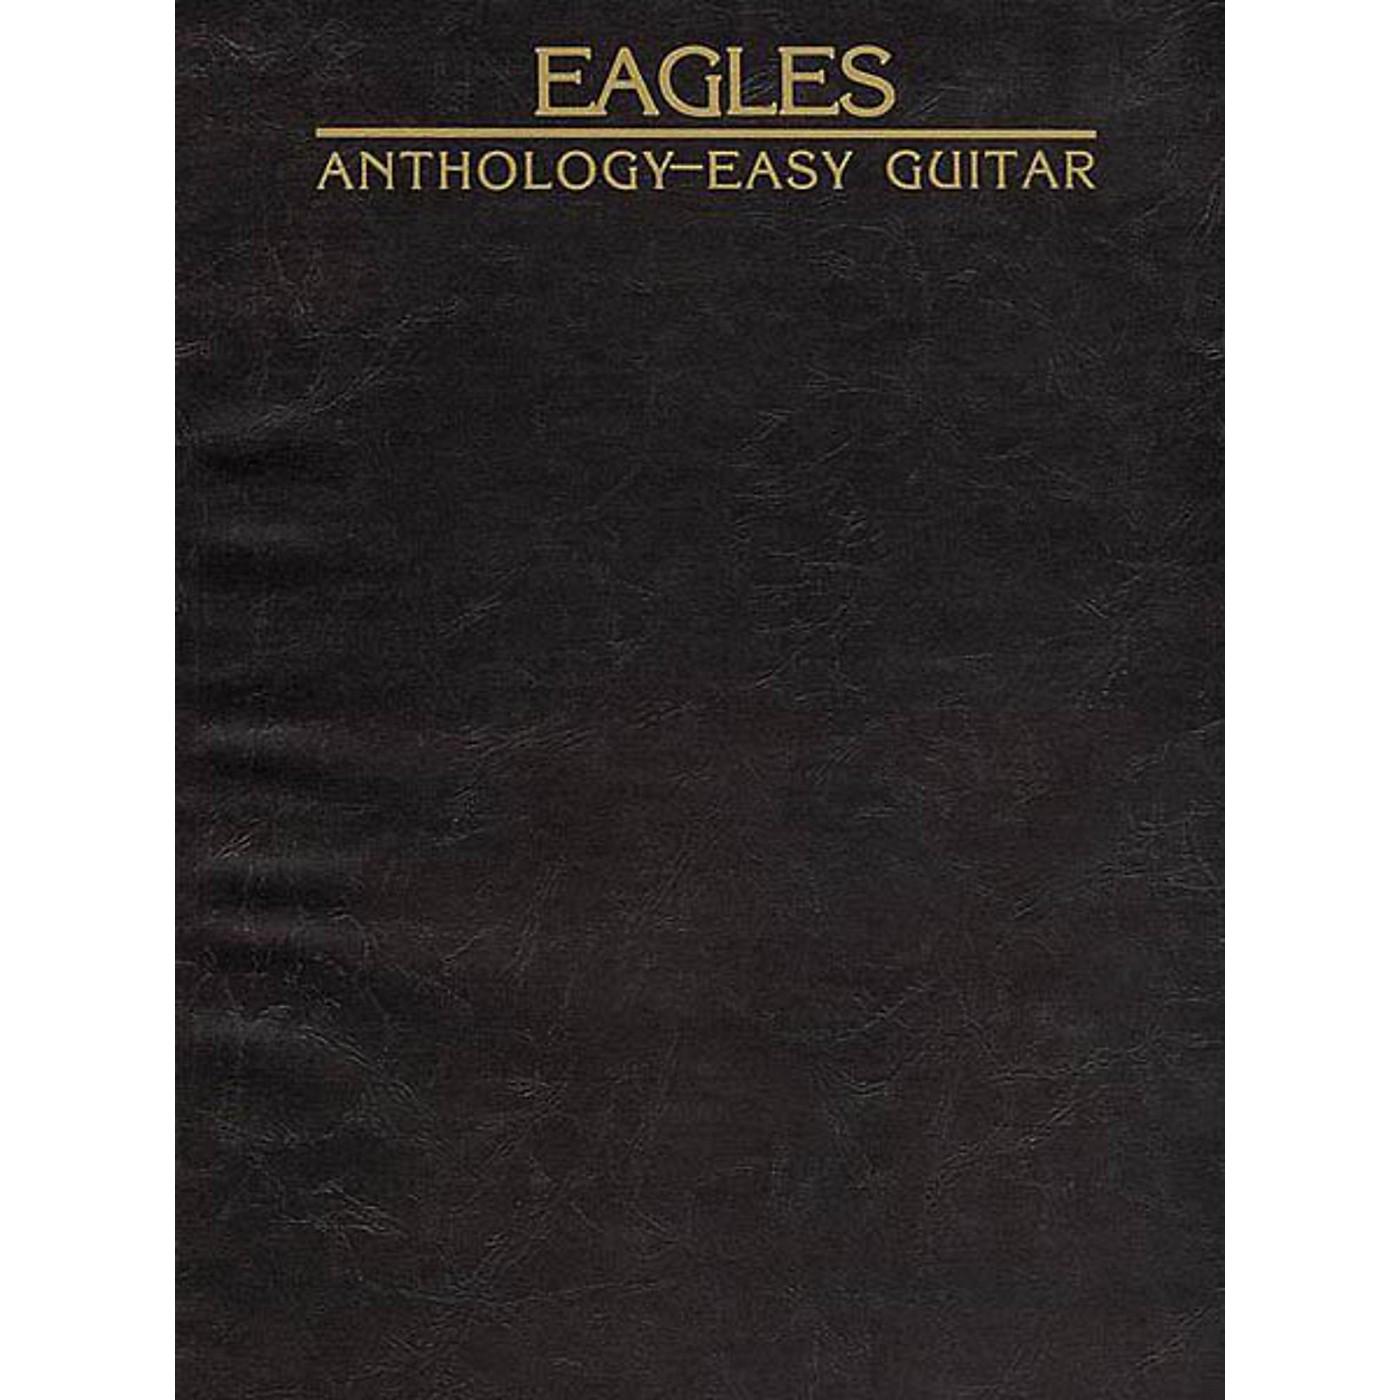 Hal Leonard Eagles Anthology Easy Guitar Songbook thumbnail